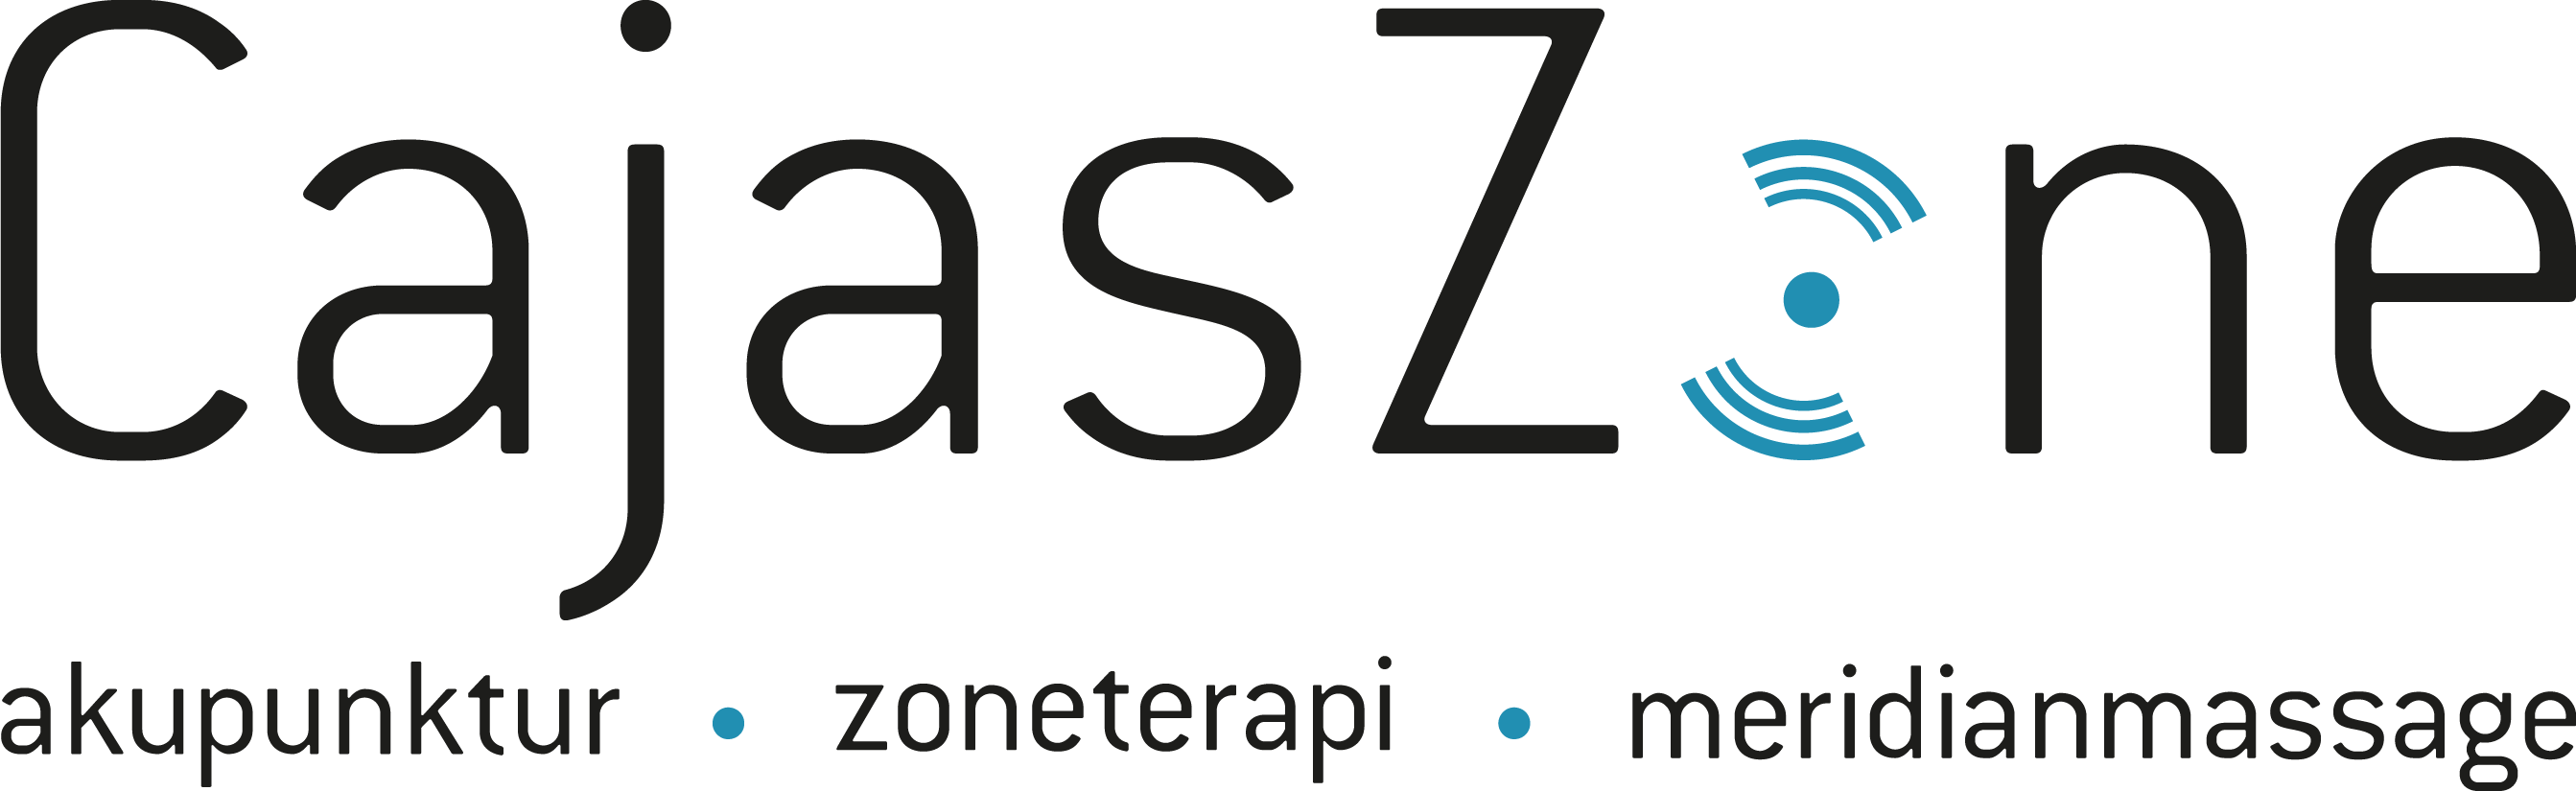 Cajas Zoneterapi